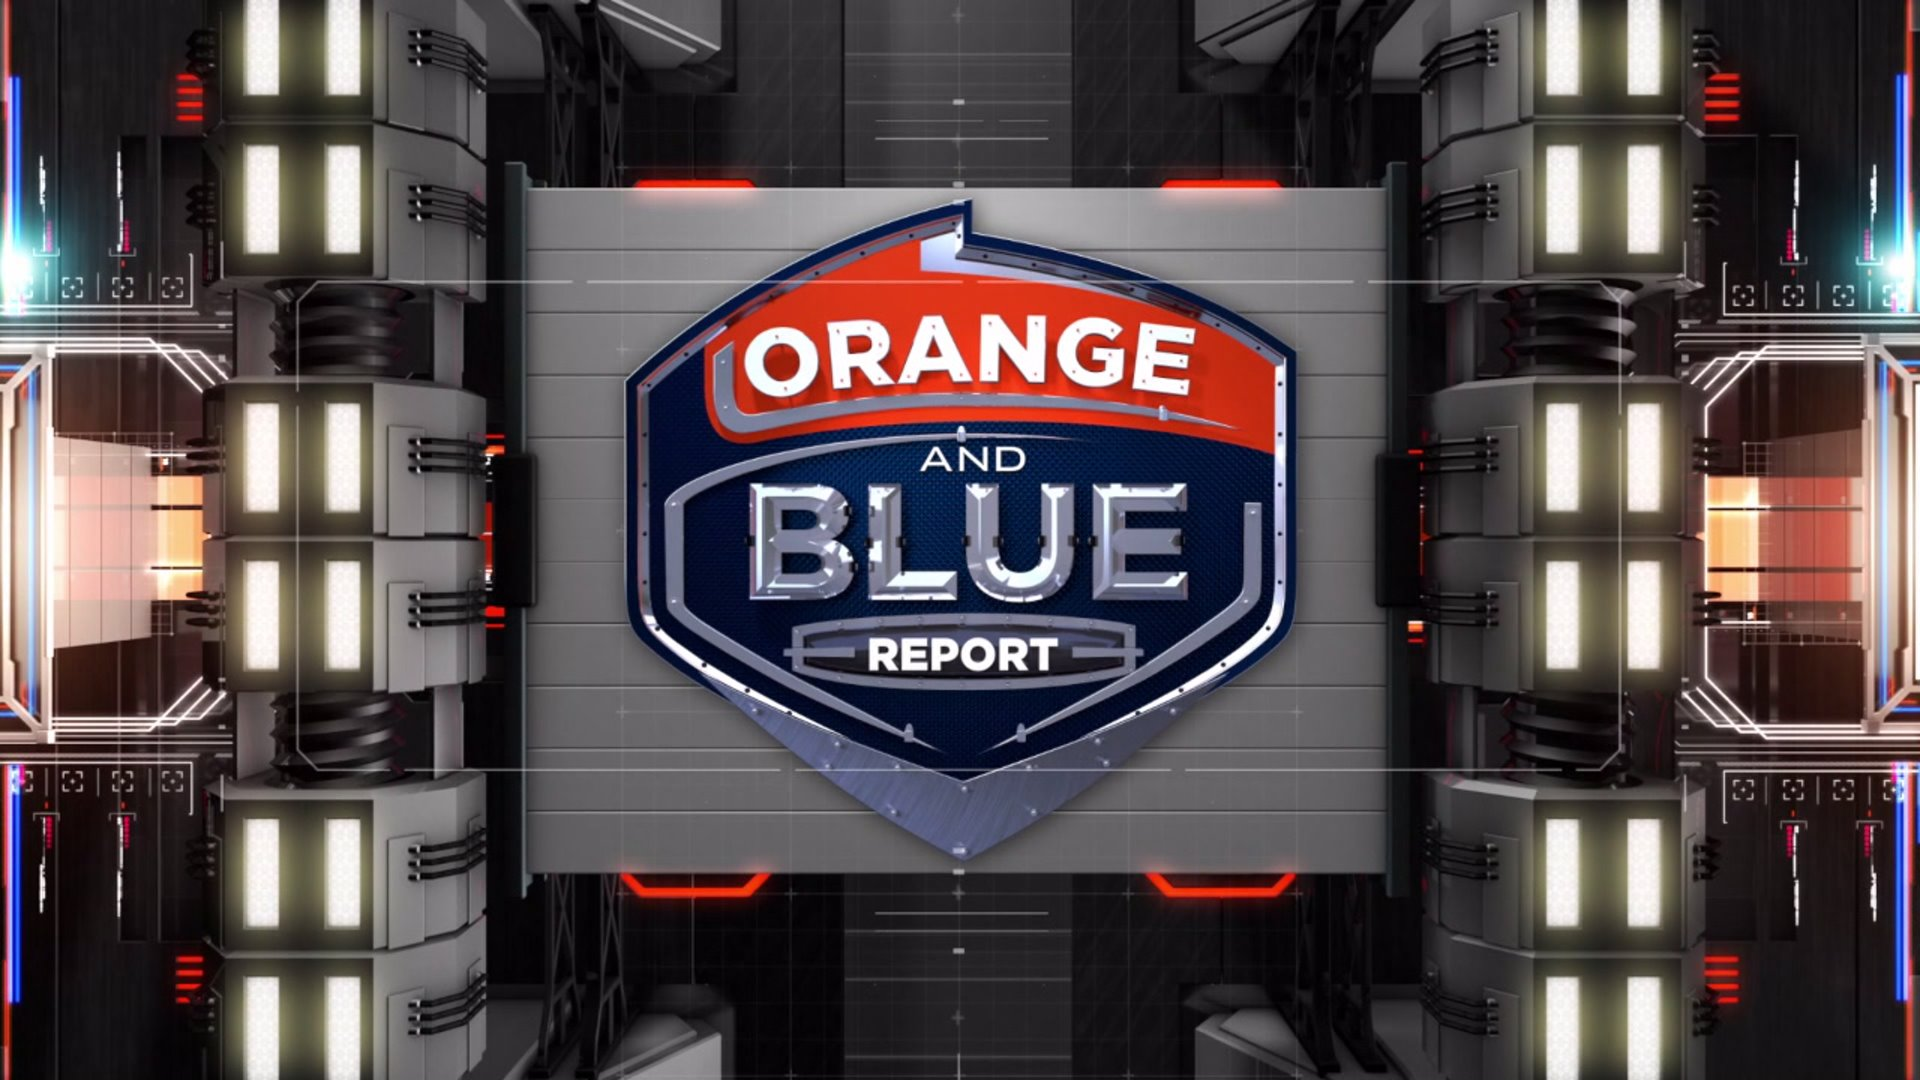 Orange and Blue Report